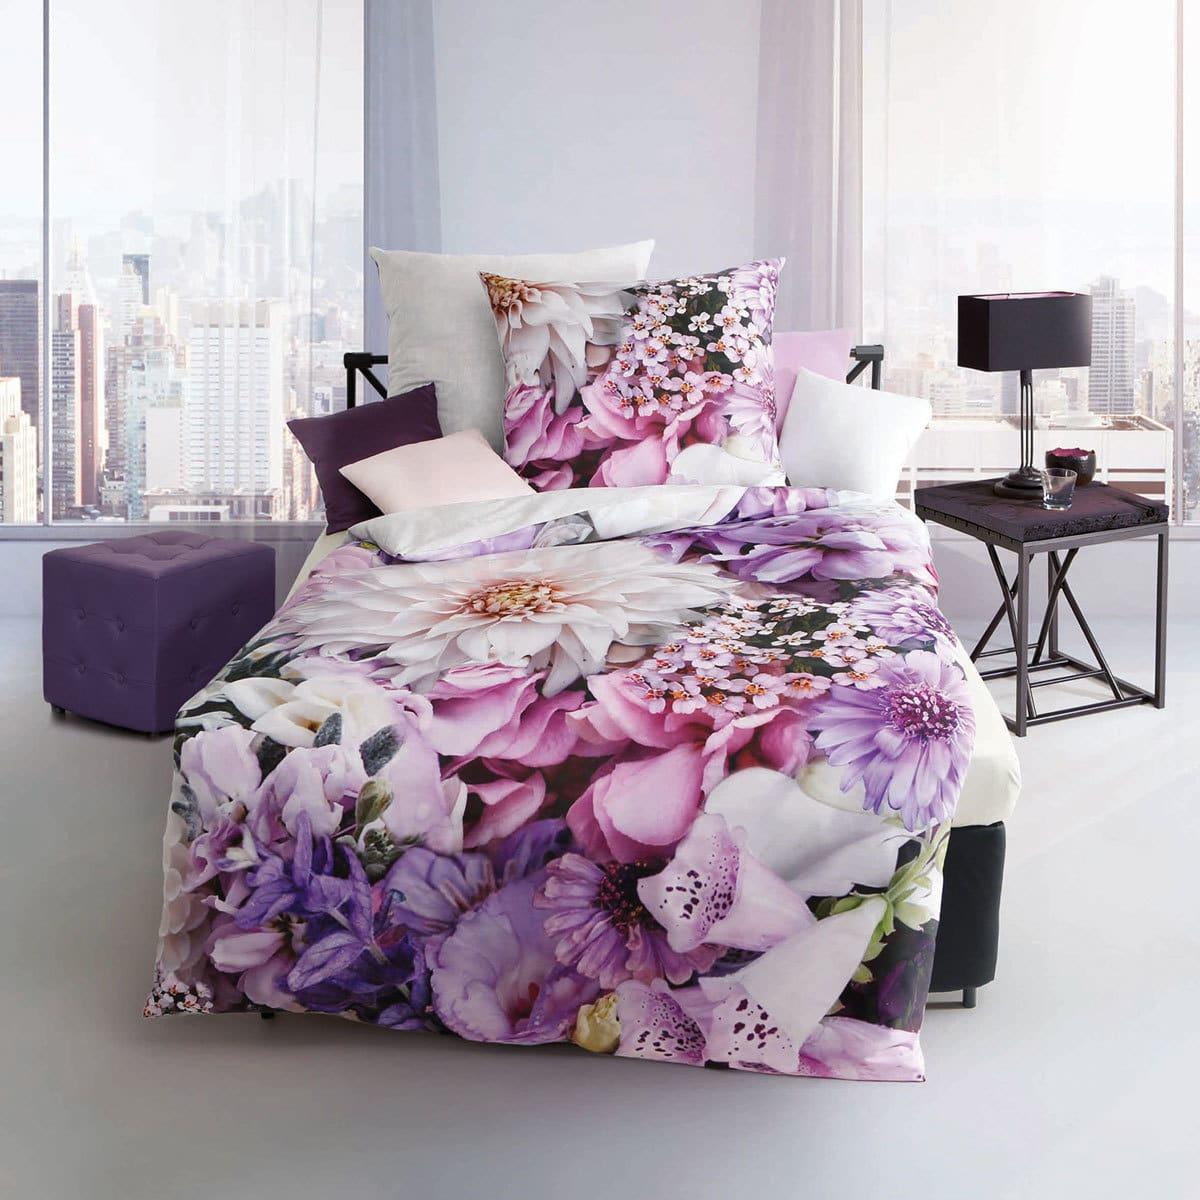 Kaeppel Mako-Satin Bettwäsche Lilac Passion flieder